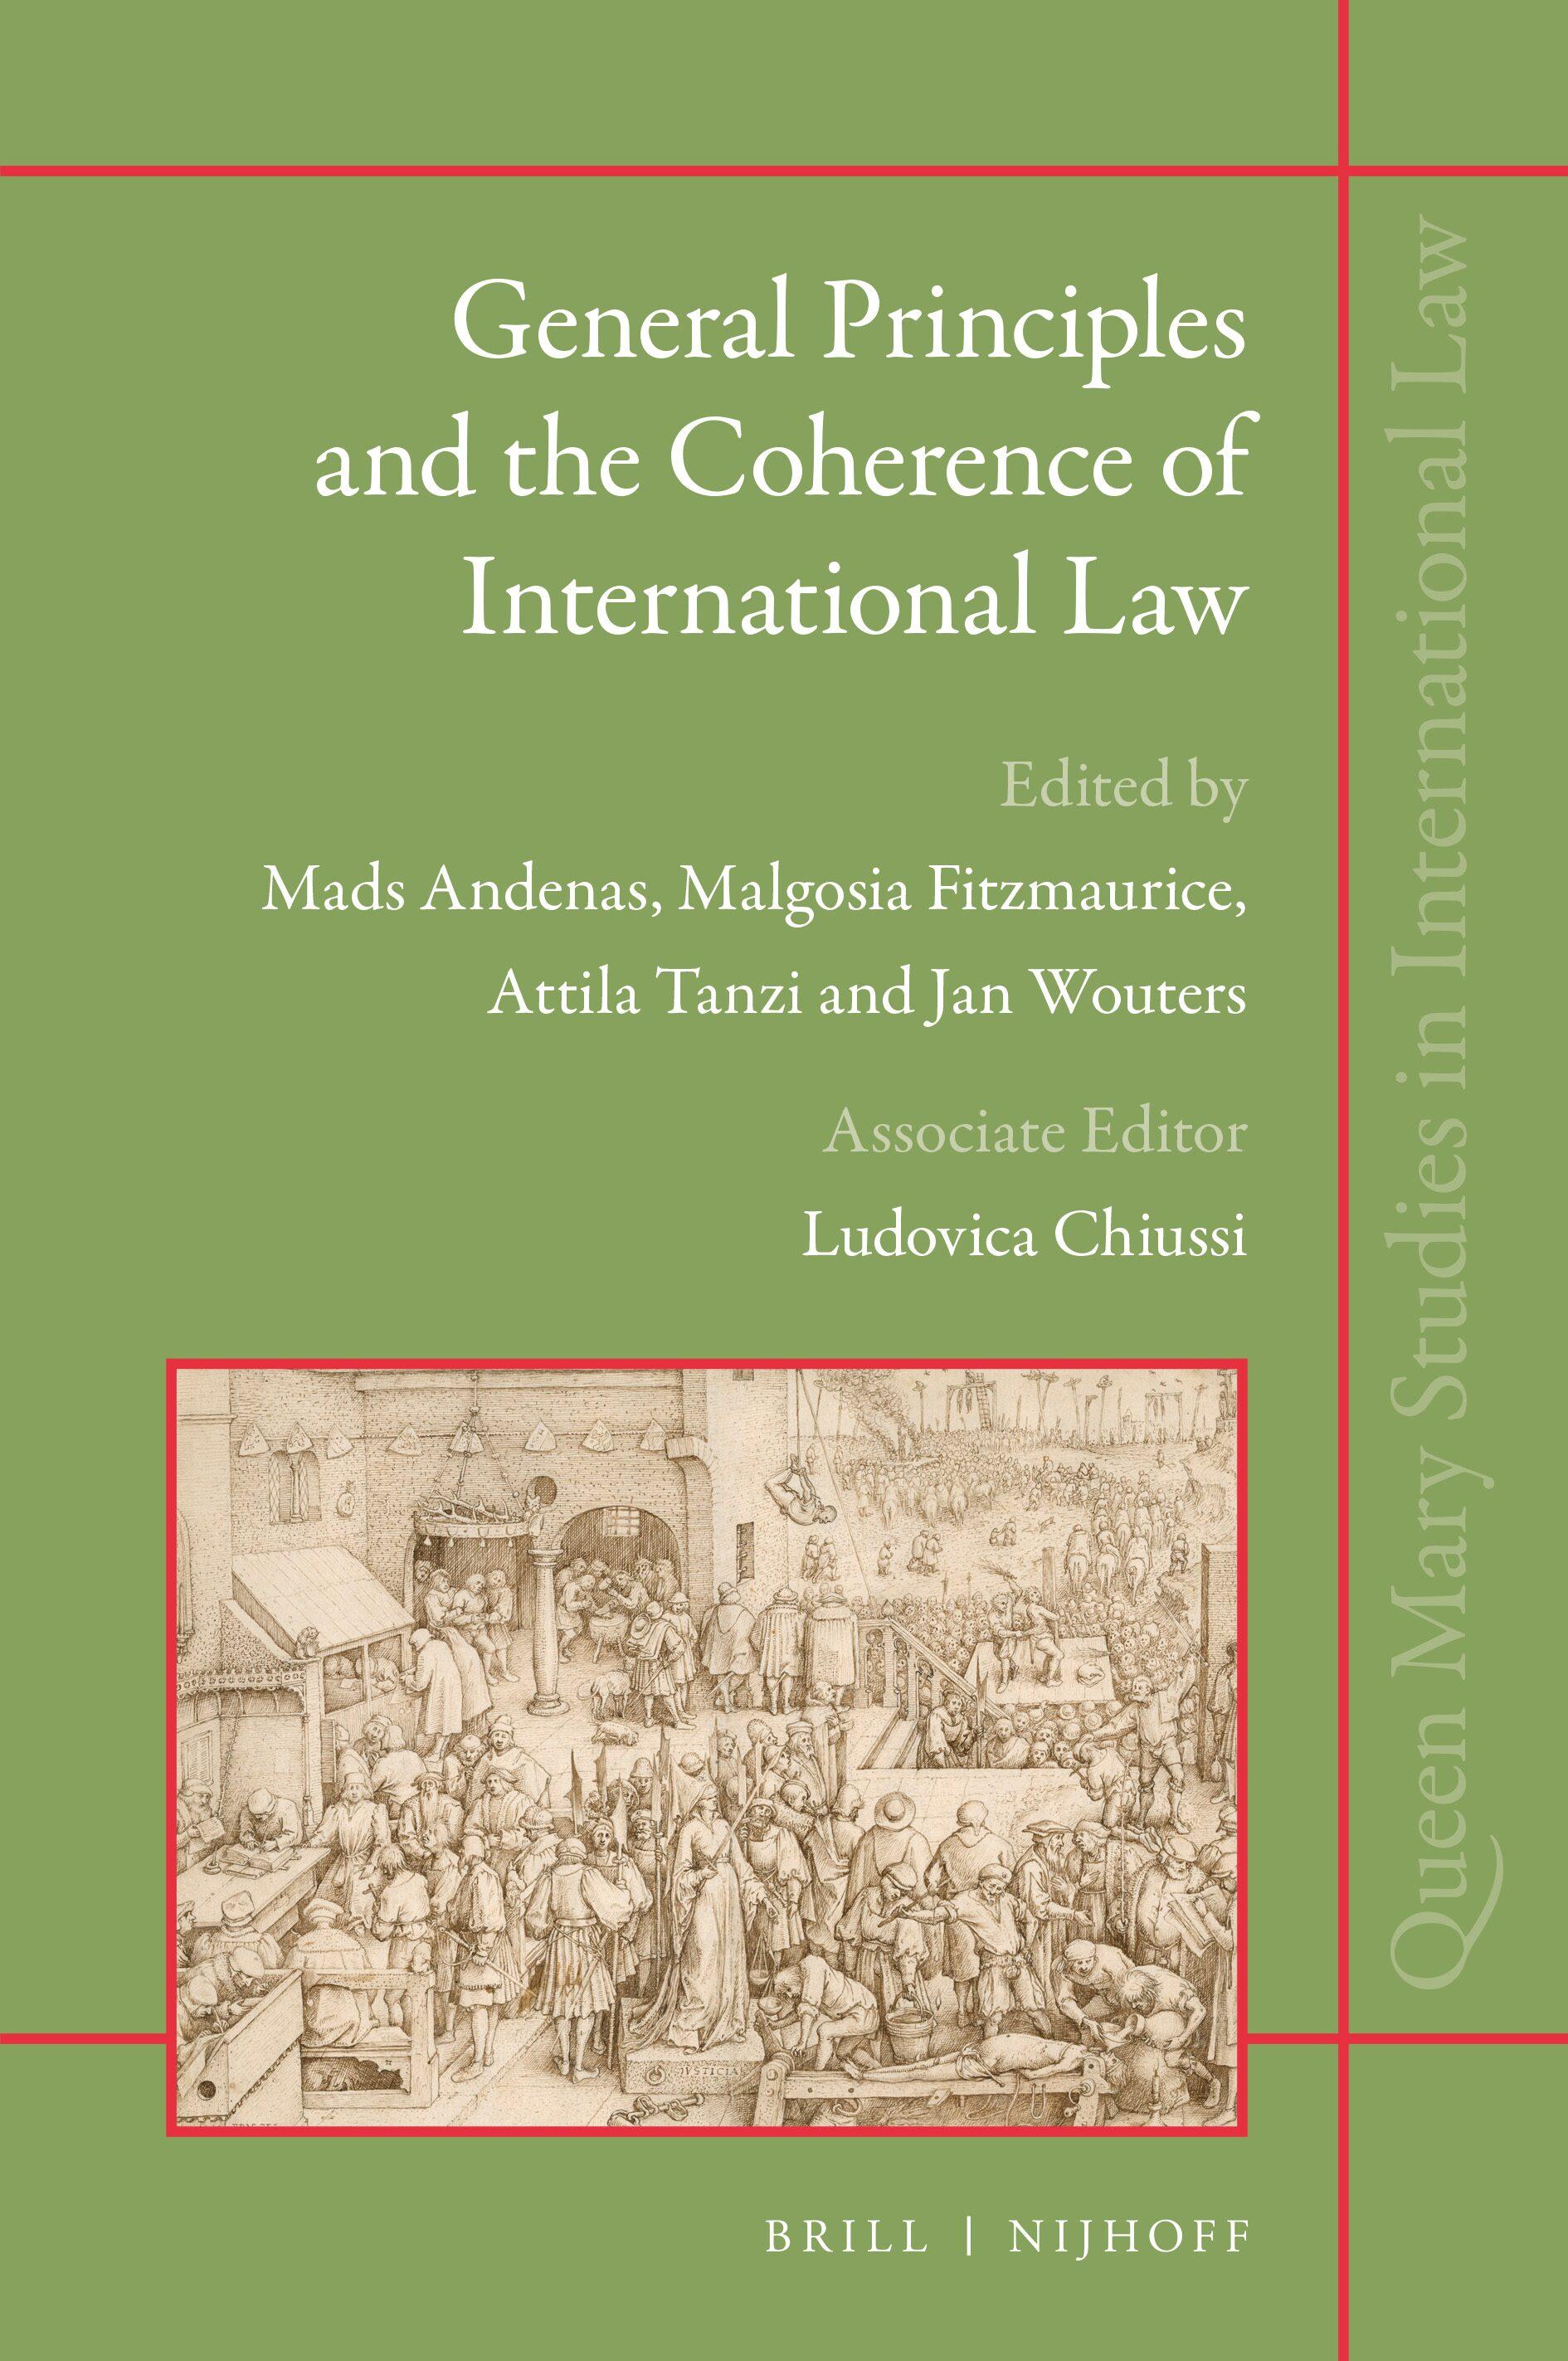 Akehurst Modern Introduction To International Law Pdf